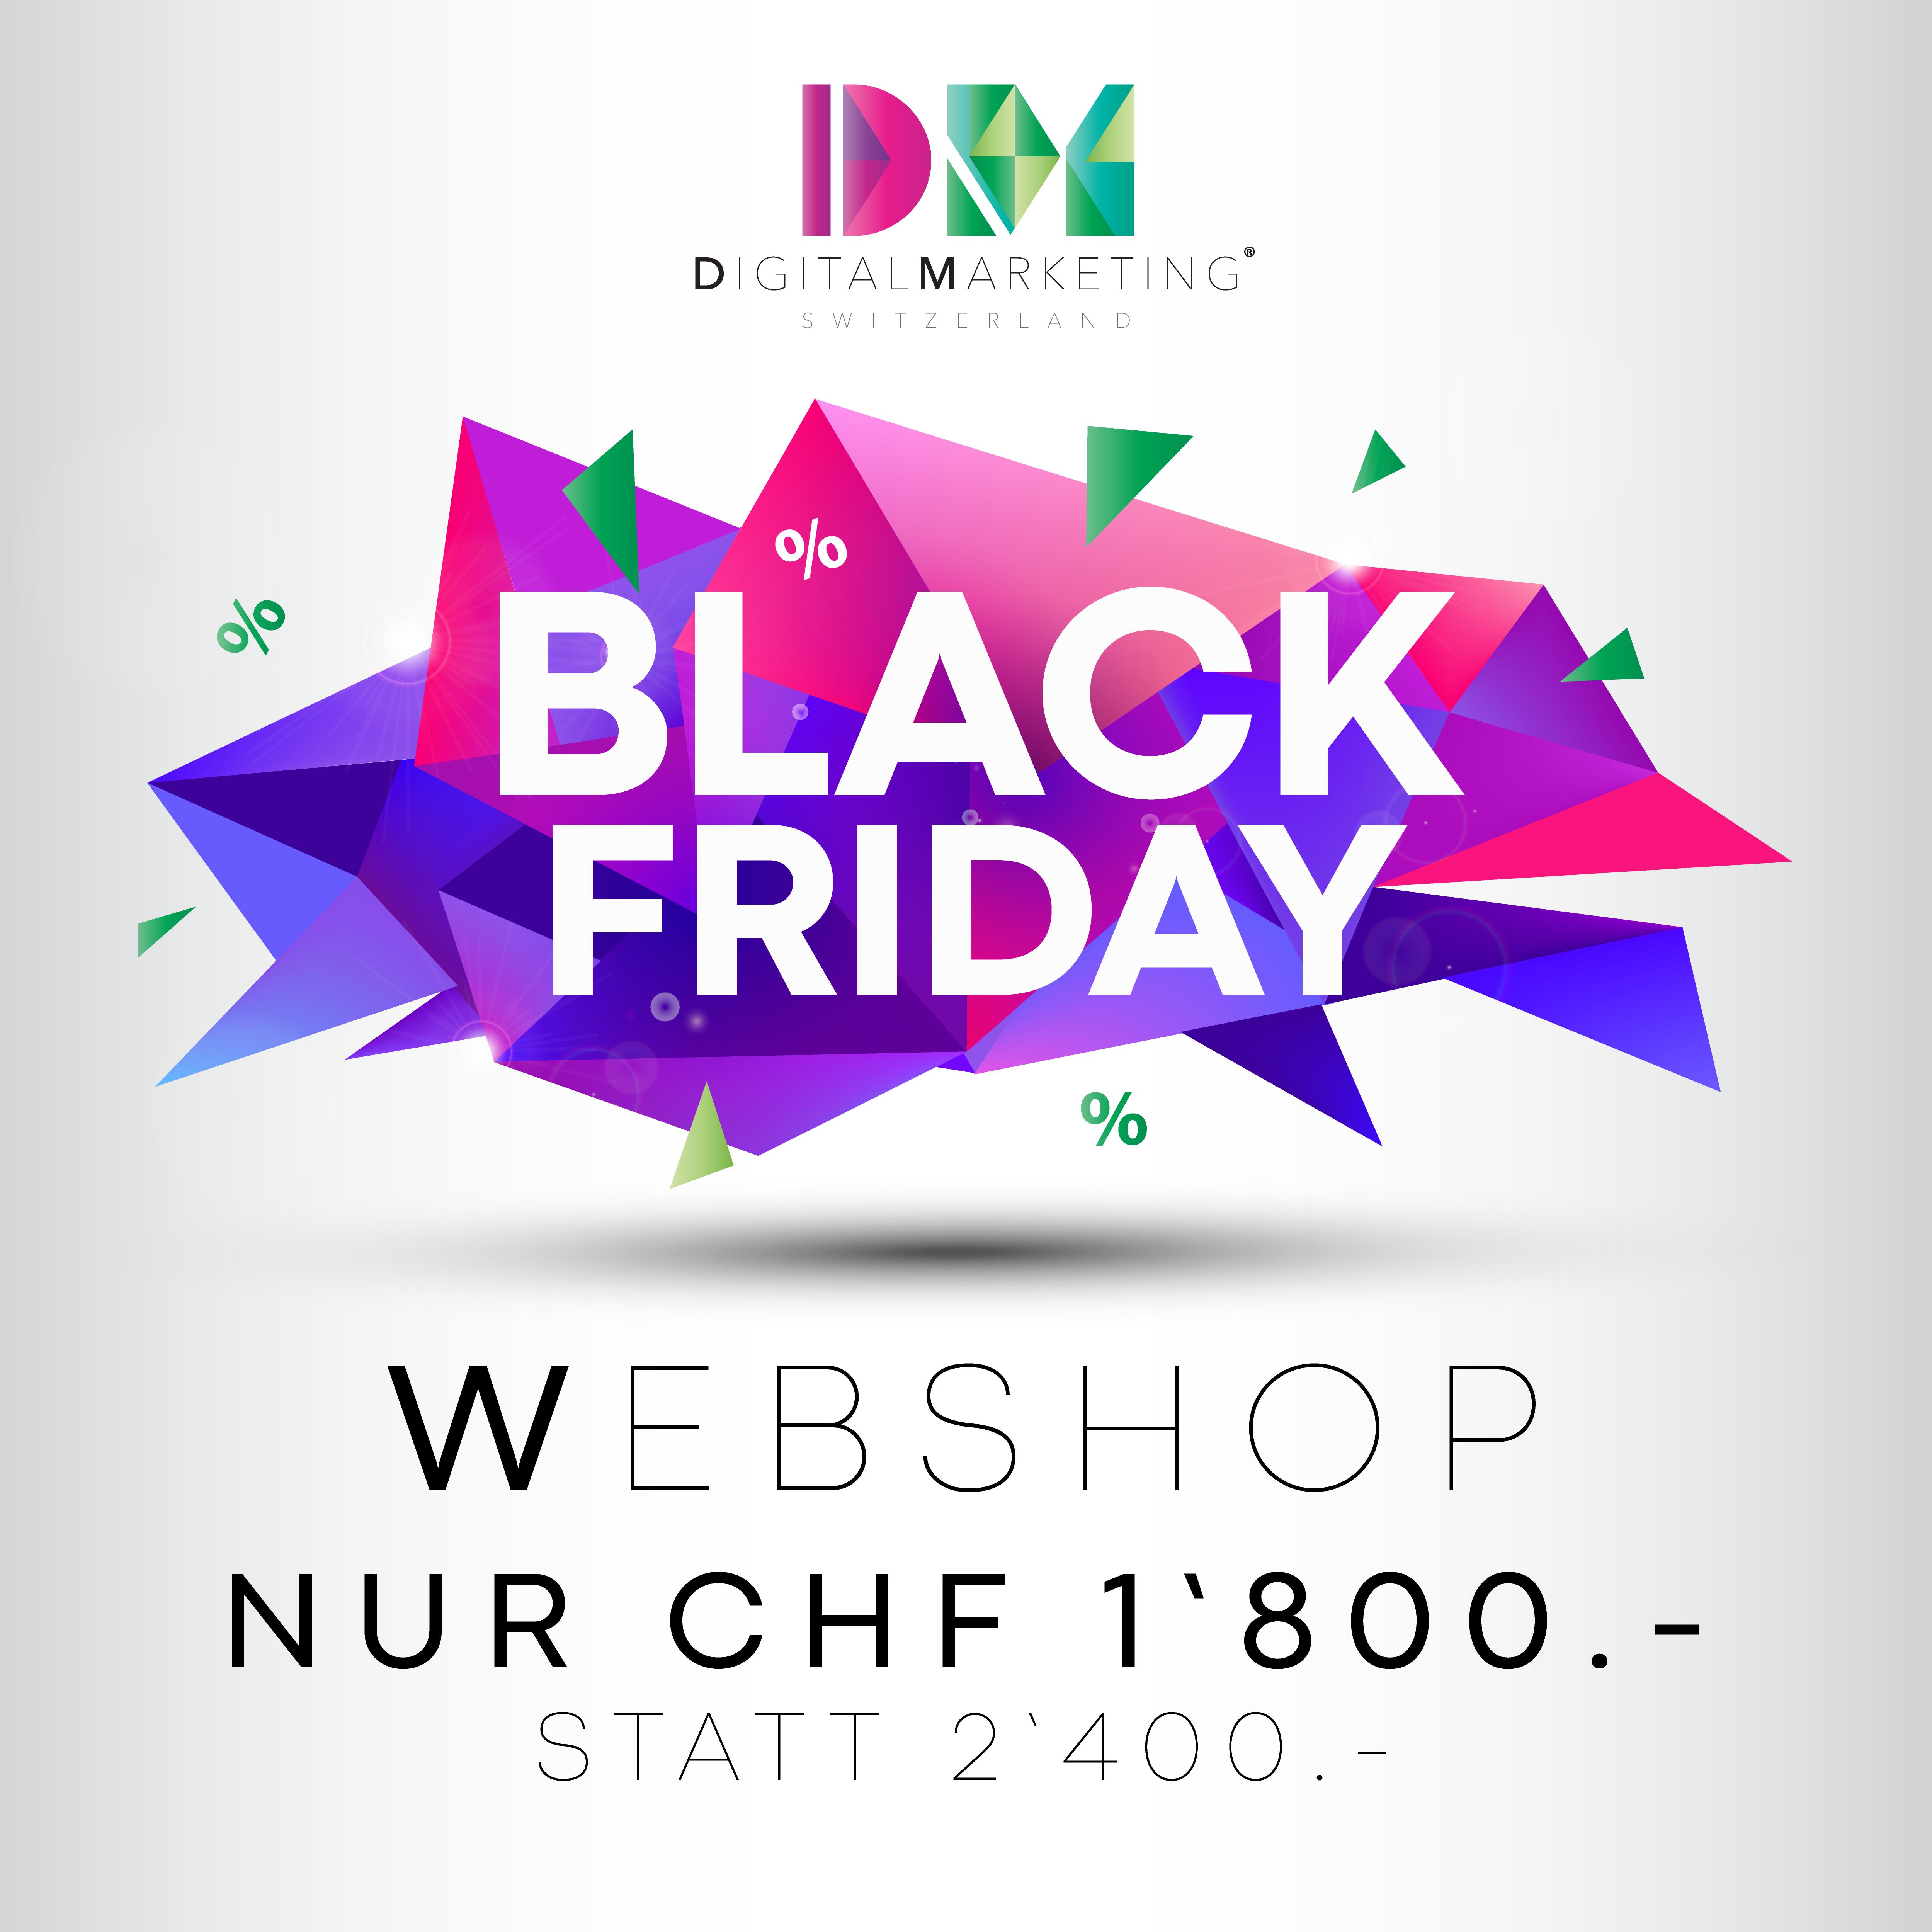 Black Friday Angebot - Digital Marketing Switzerland - Webshop